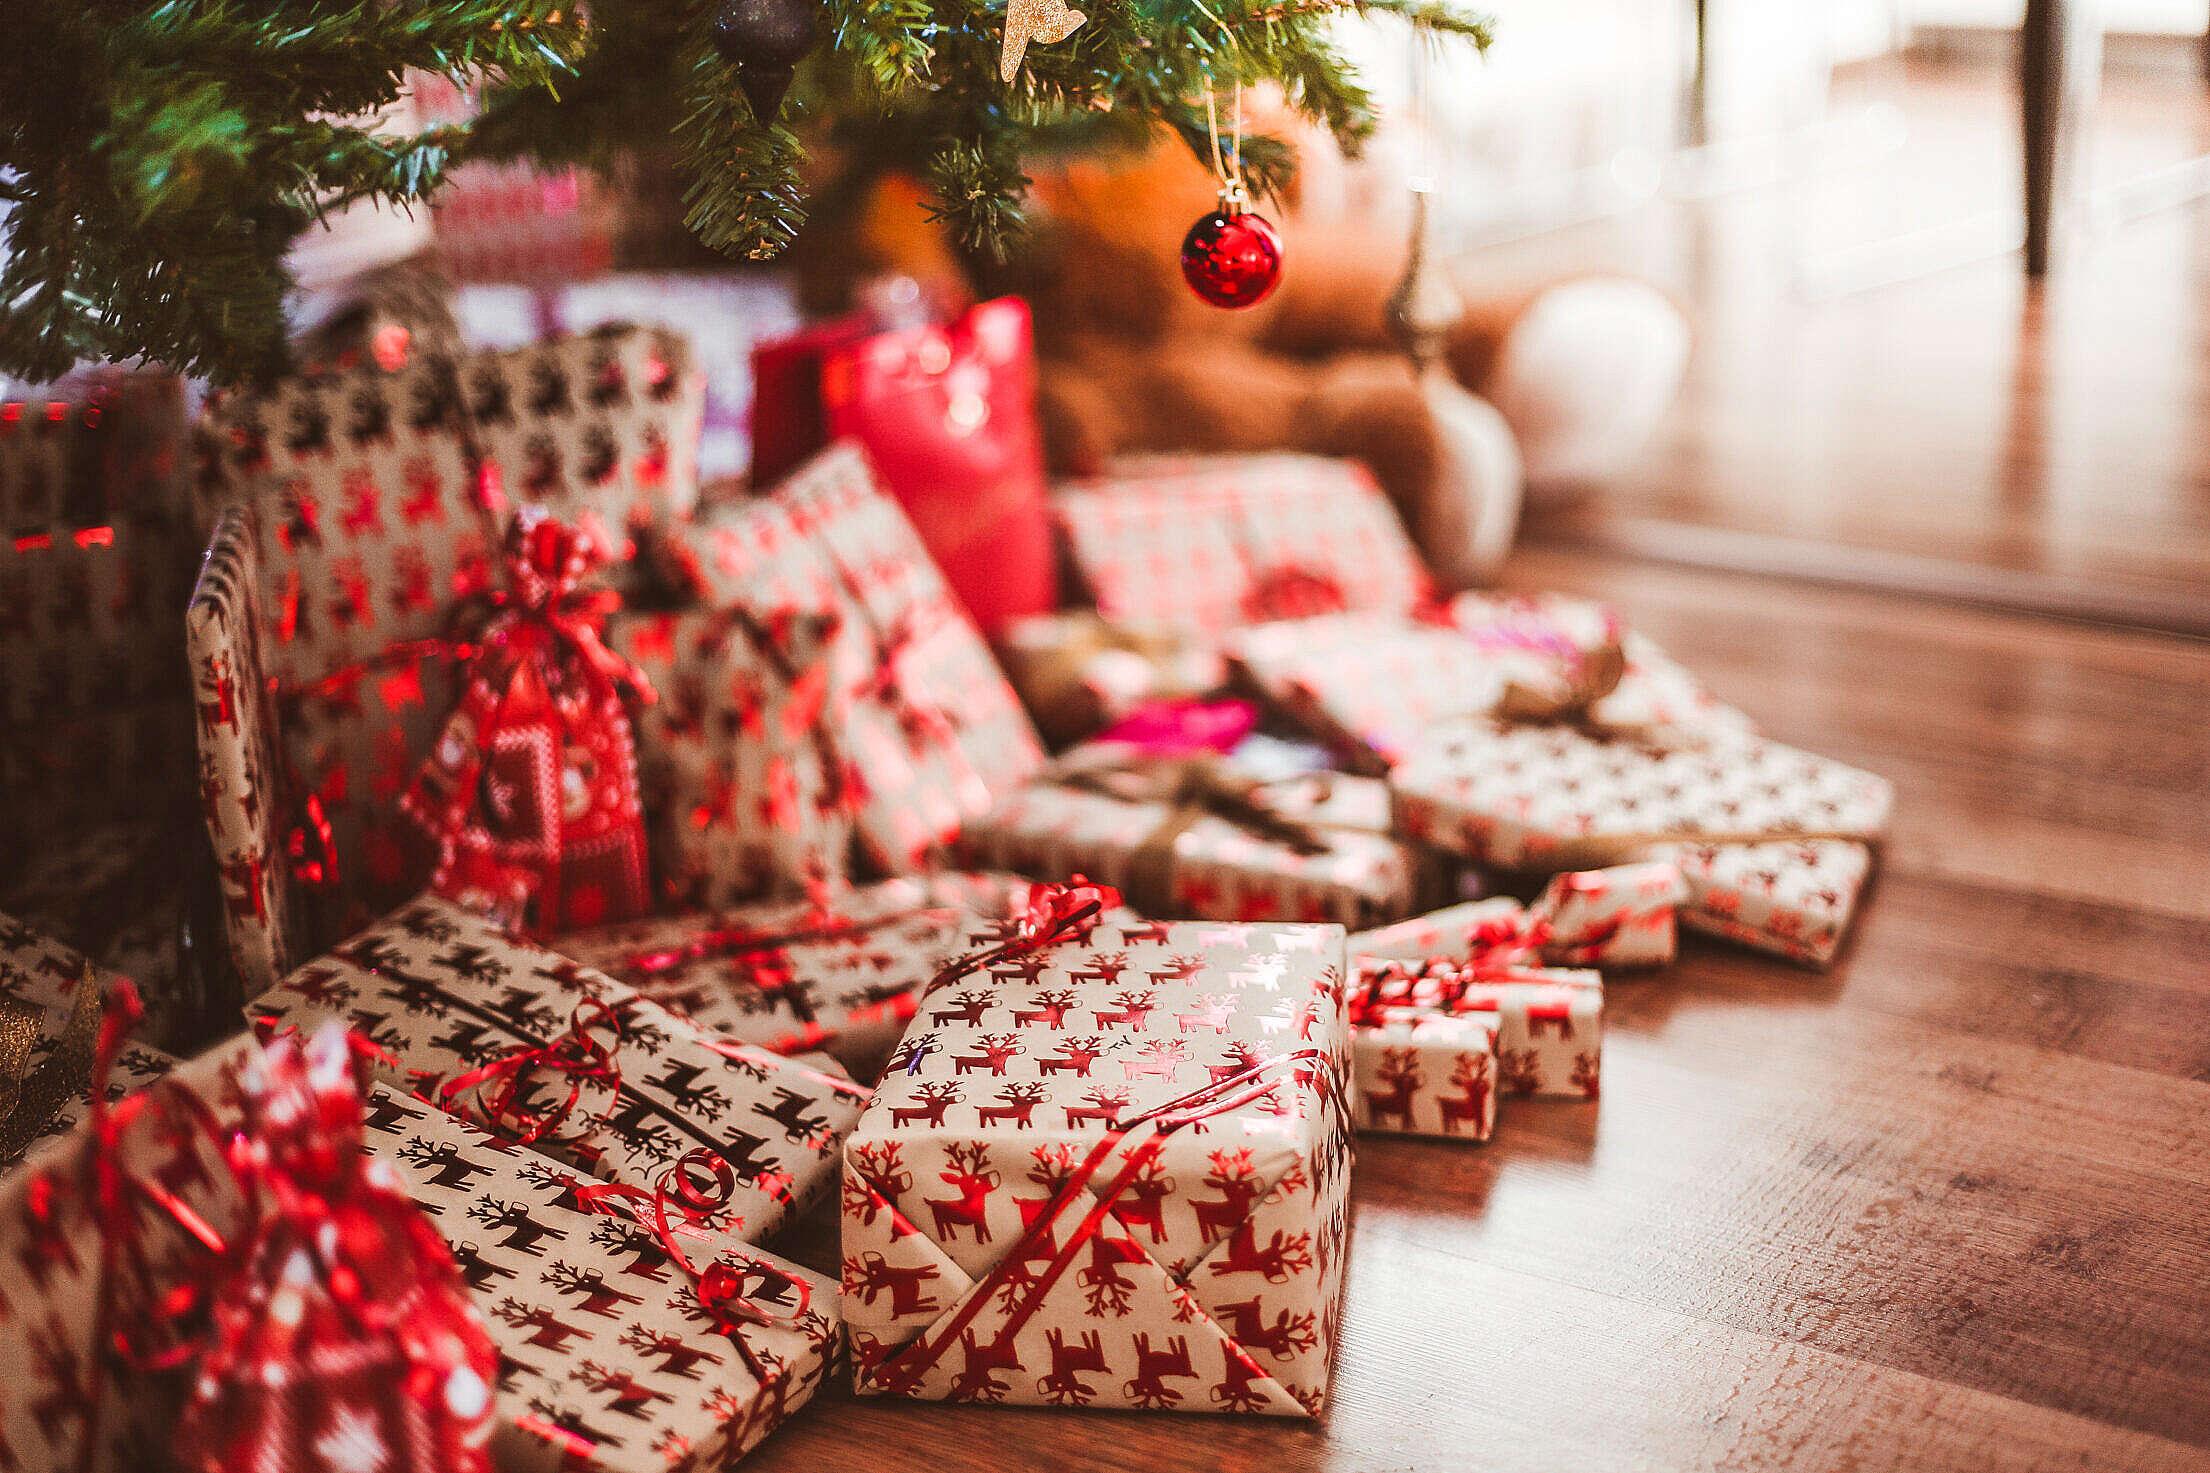 Christmas Presents Under Tree Free Stock Photo